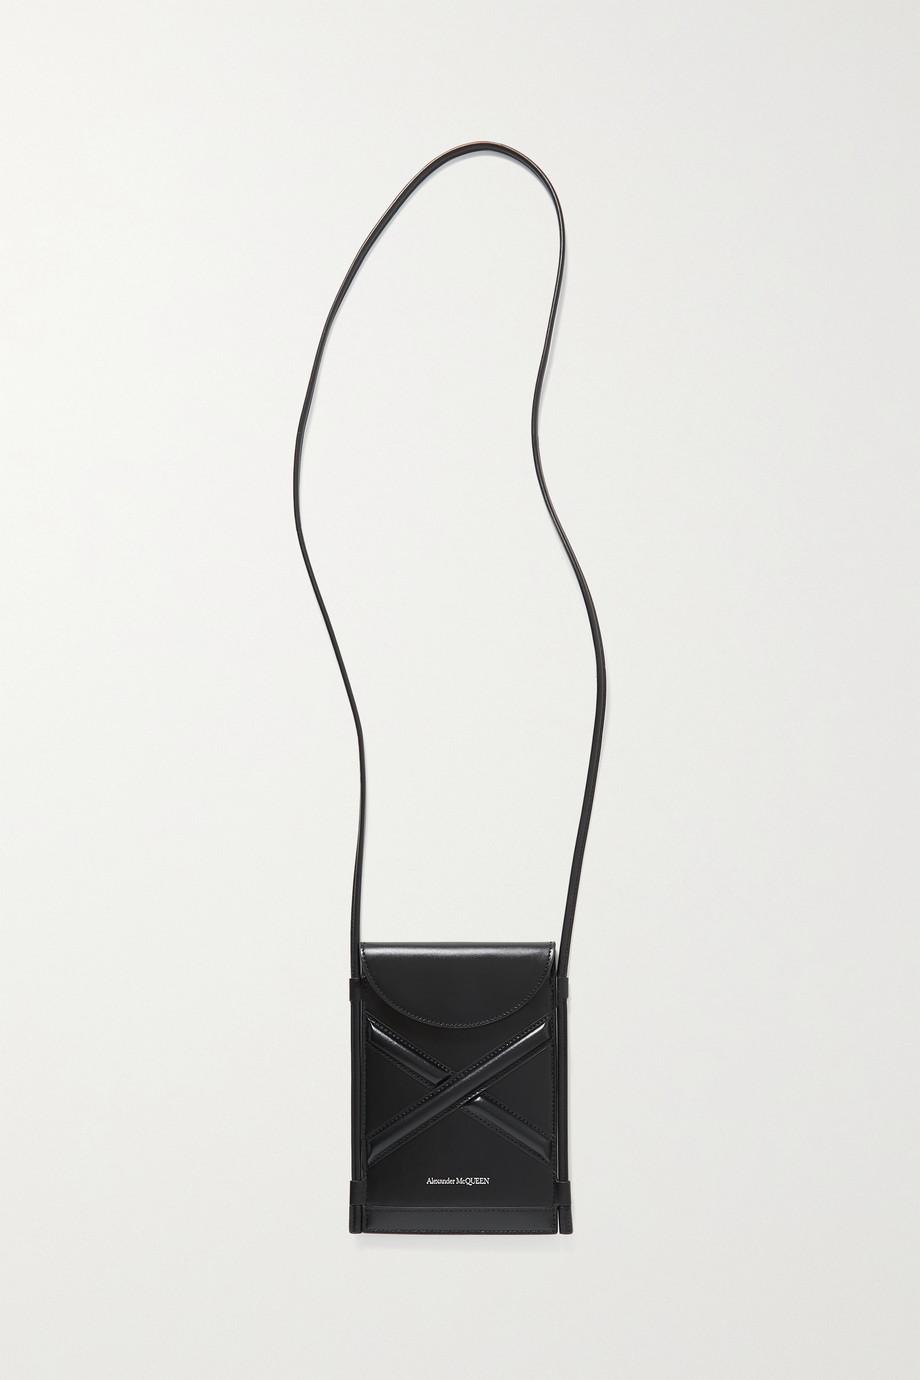 Alexander McQueen Pochette en cuir The Curve